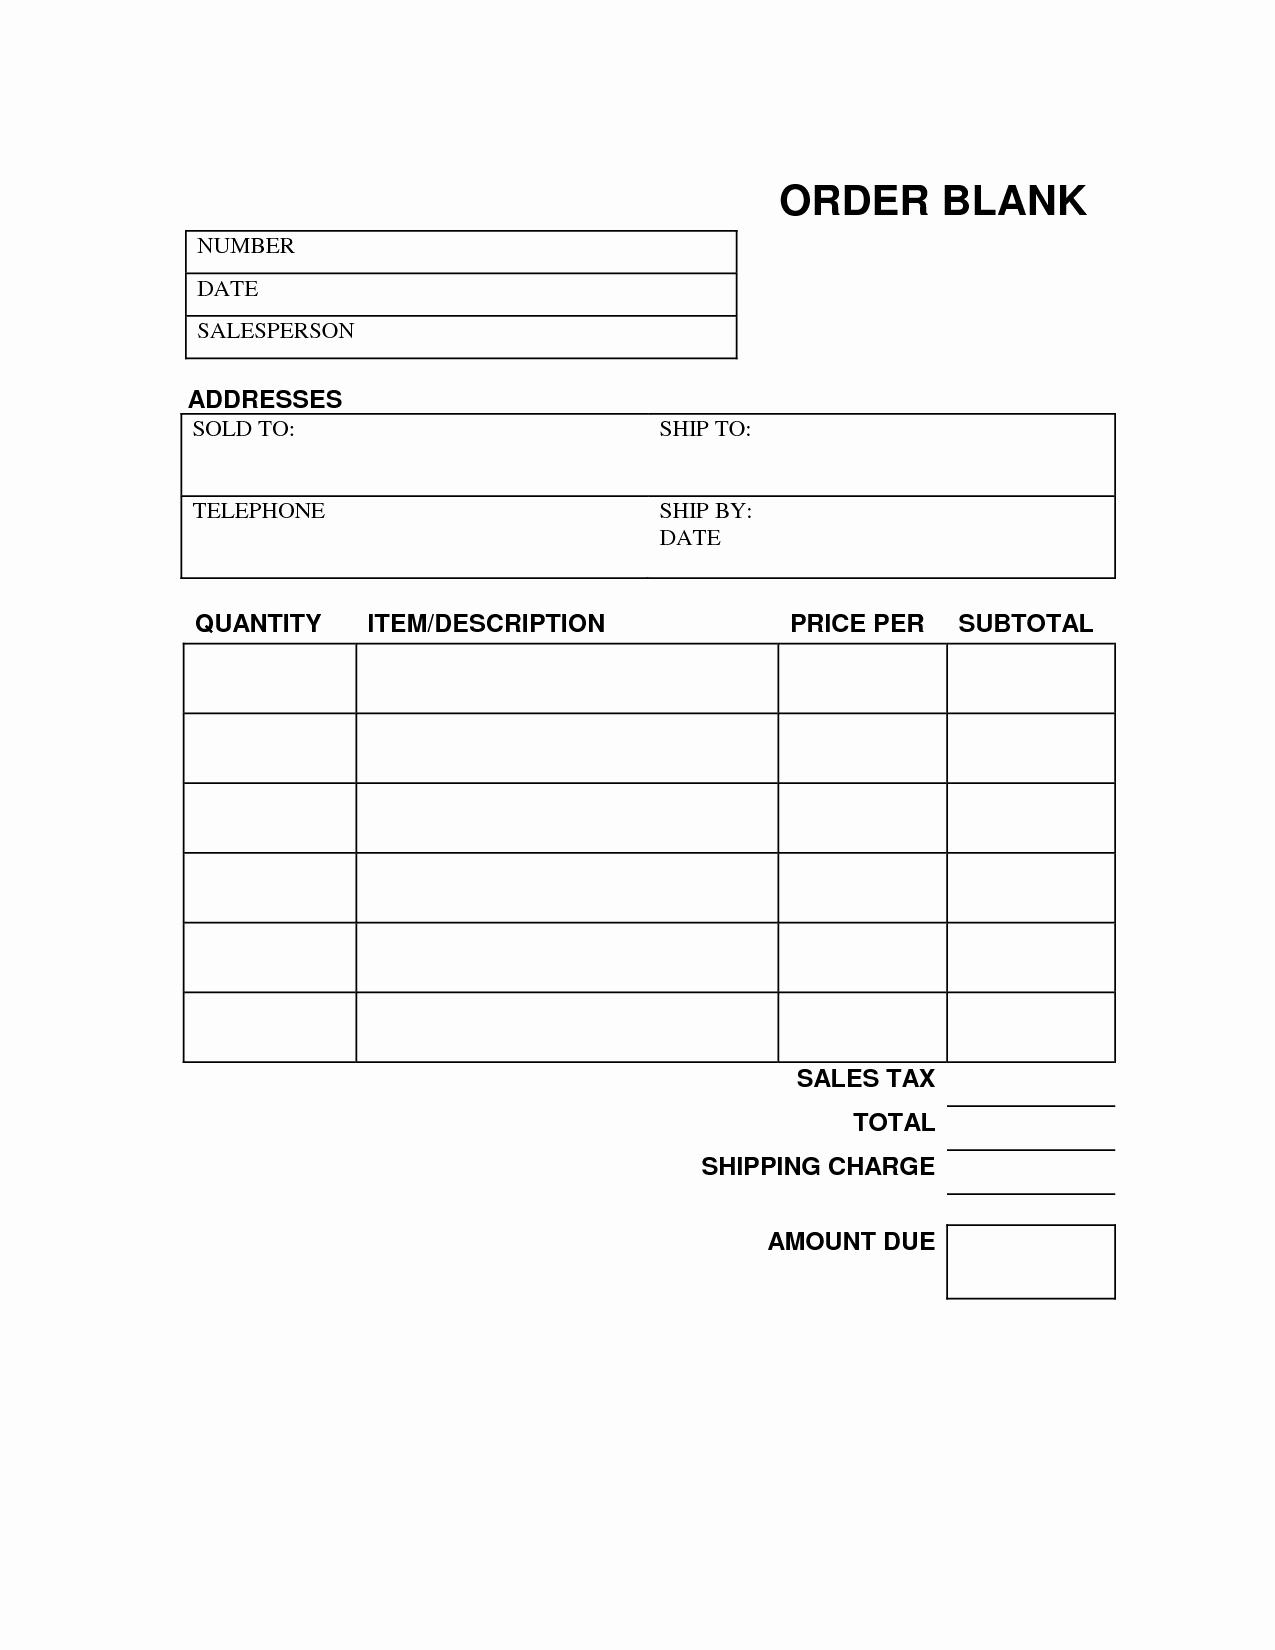 Free Printable Work order Template Lovely Blank order form Printable